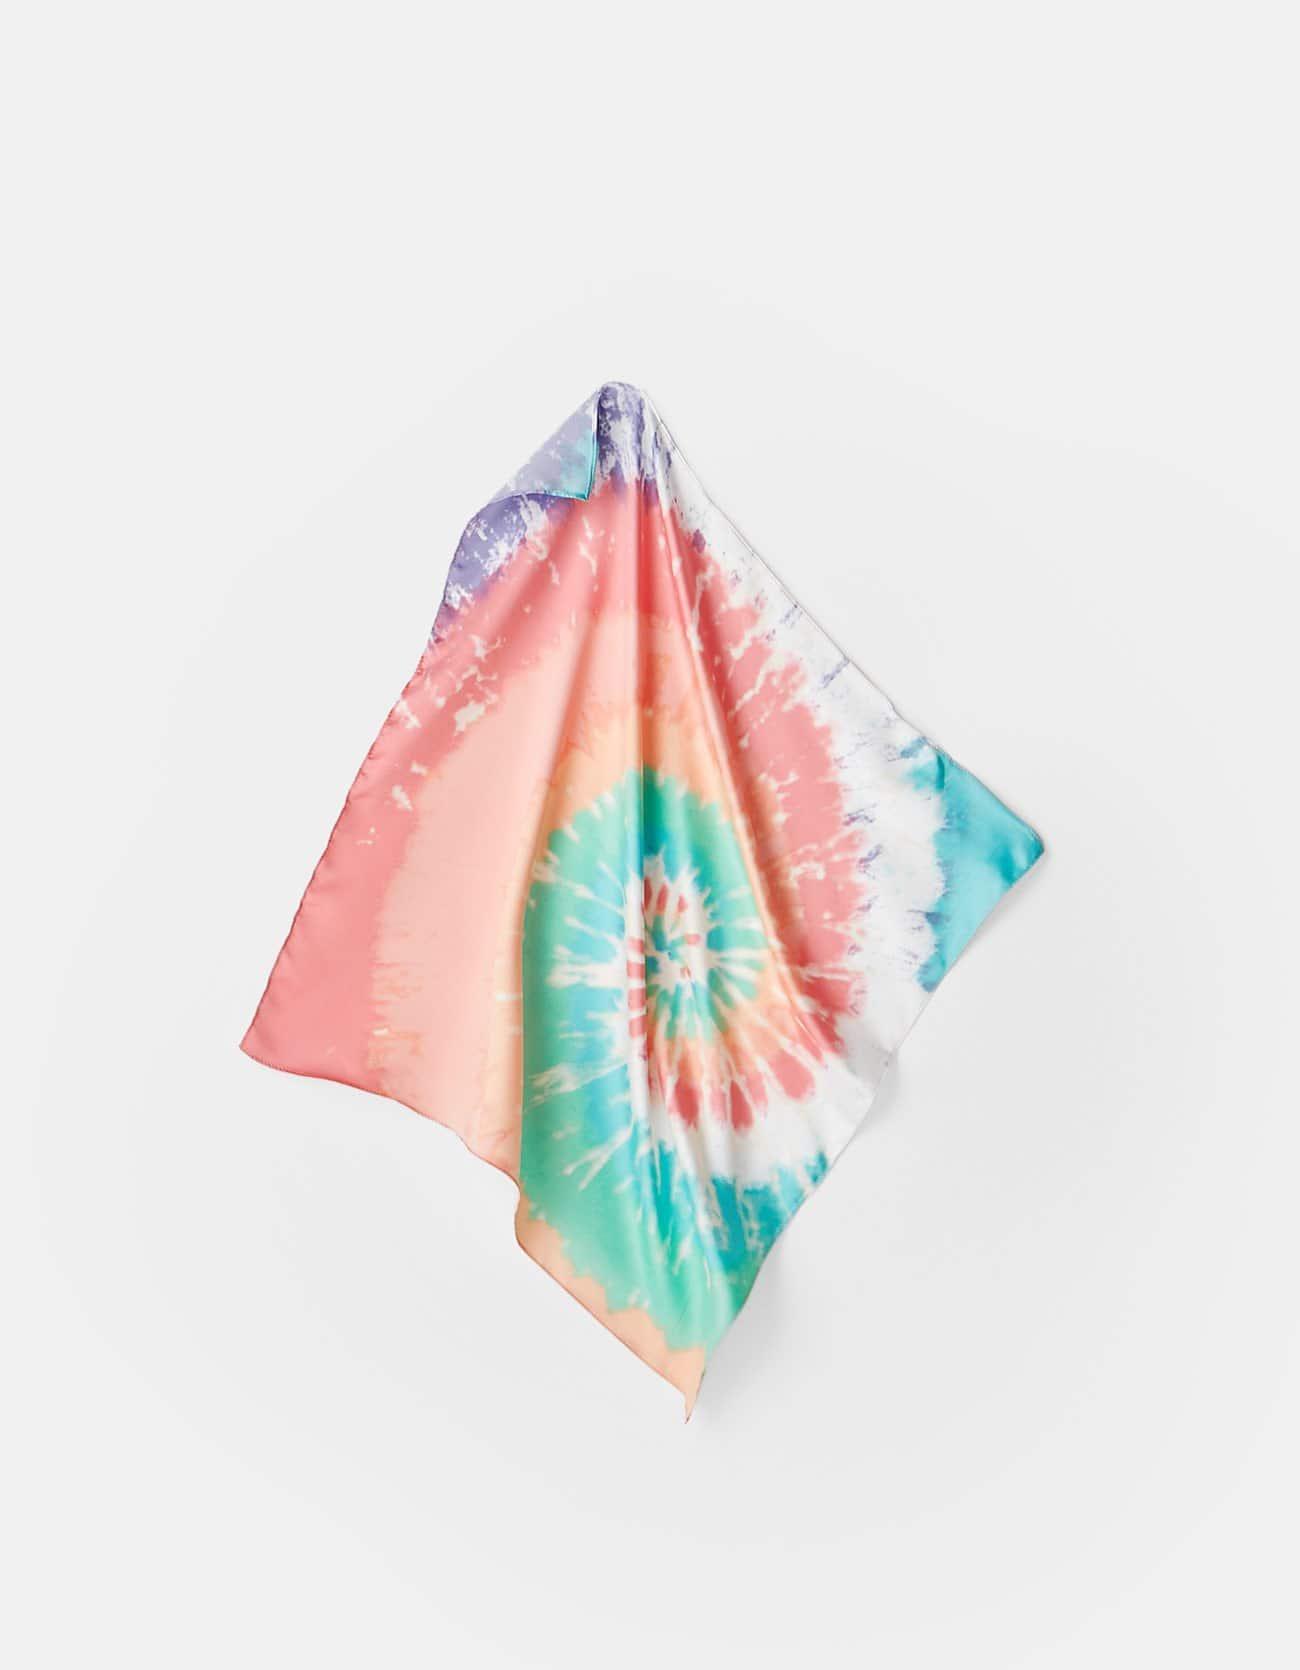 Pañuelo tie-dye de colores, ideal para complementar looks.